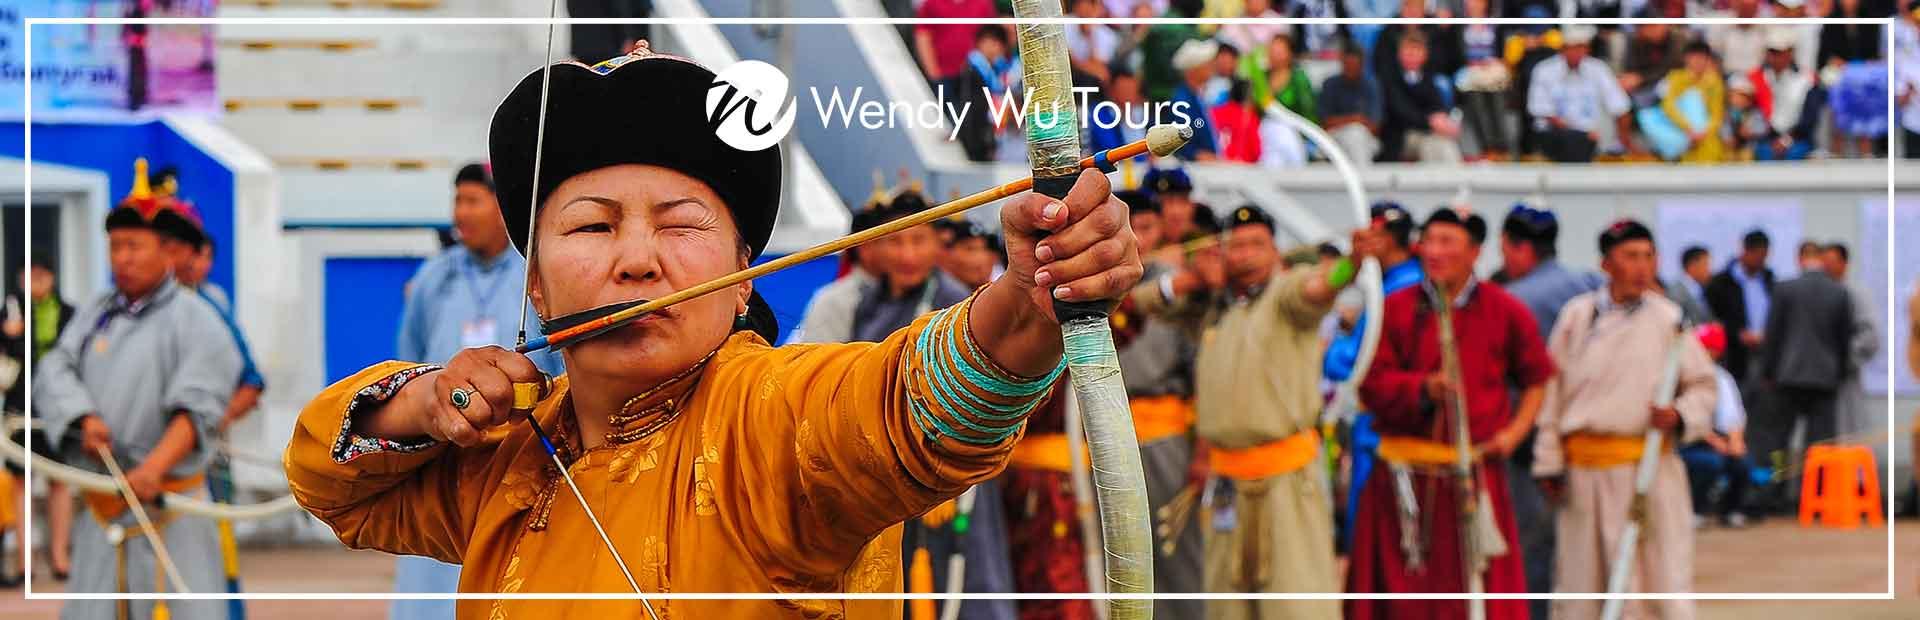 Naadam Festival archery